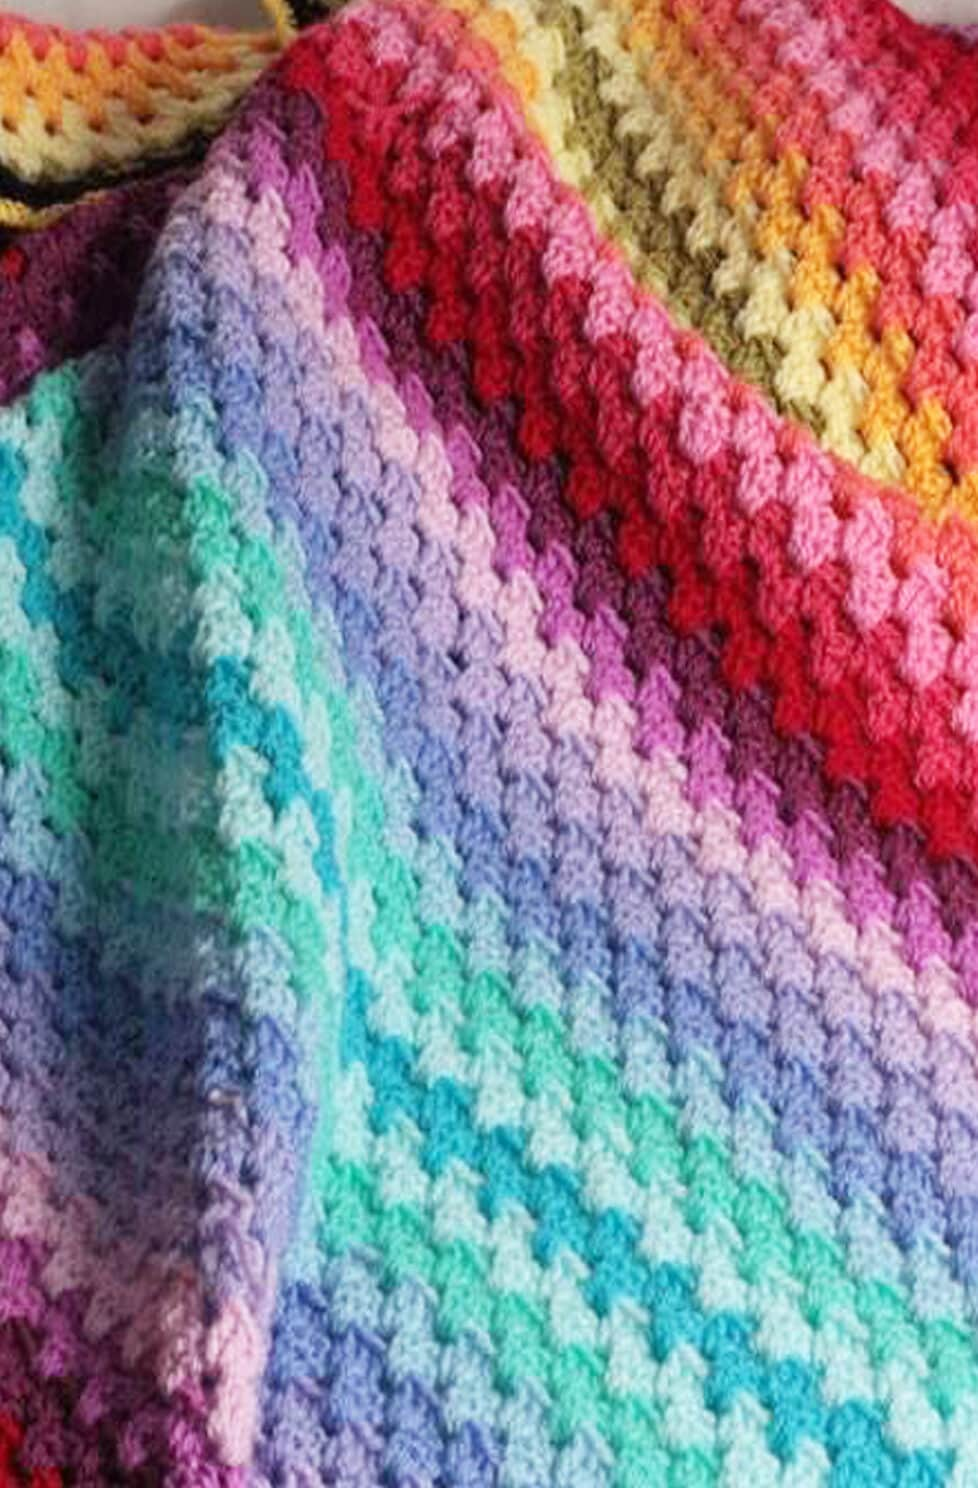 10 Temperature Blanket Patterns